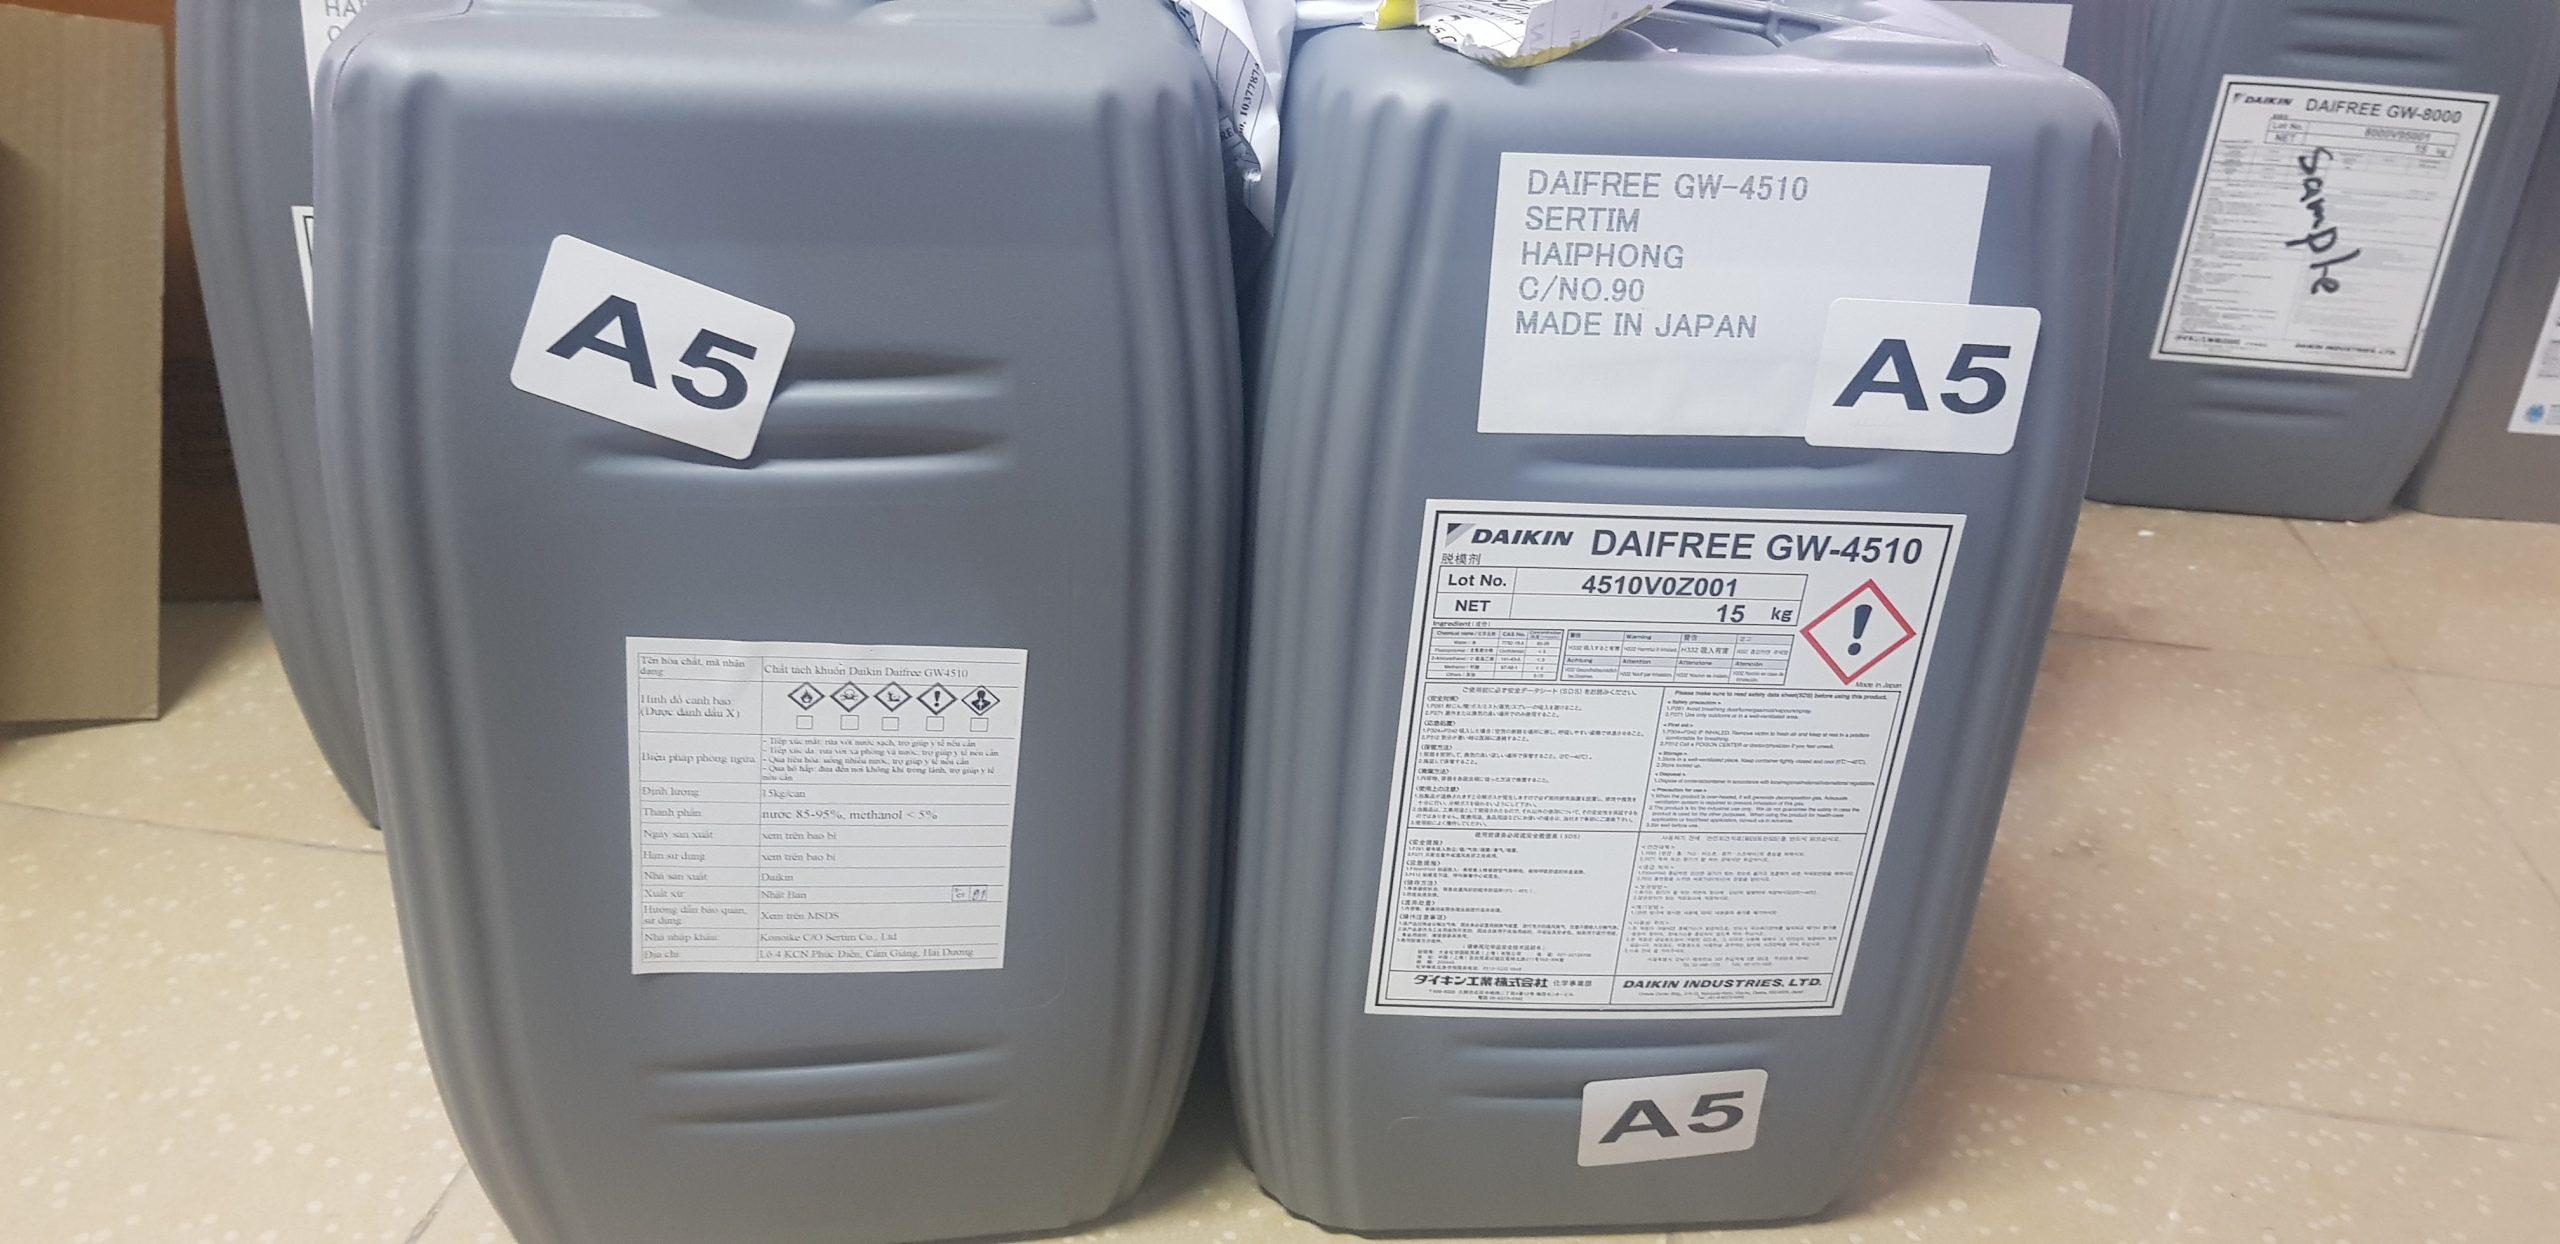 Daikin Daifree GW-4510 chất tách khuôn cao su